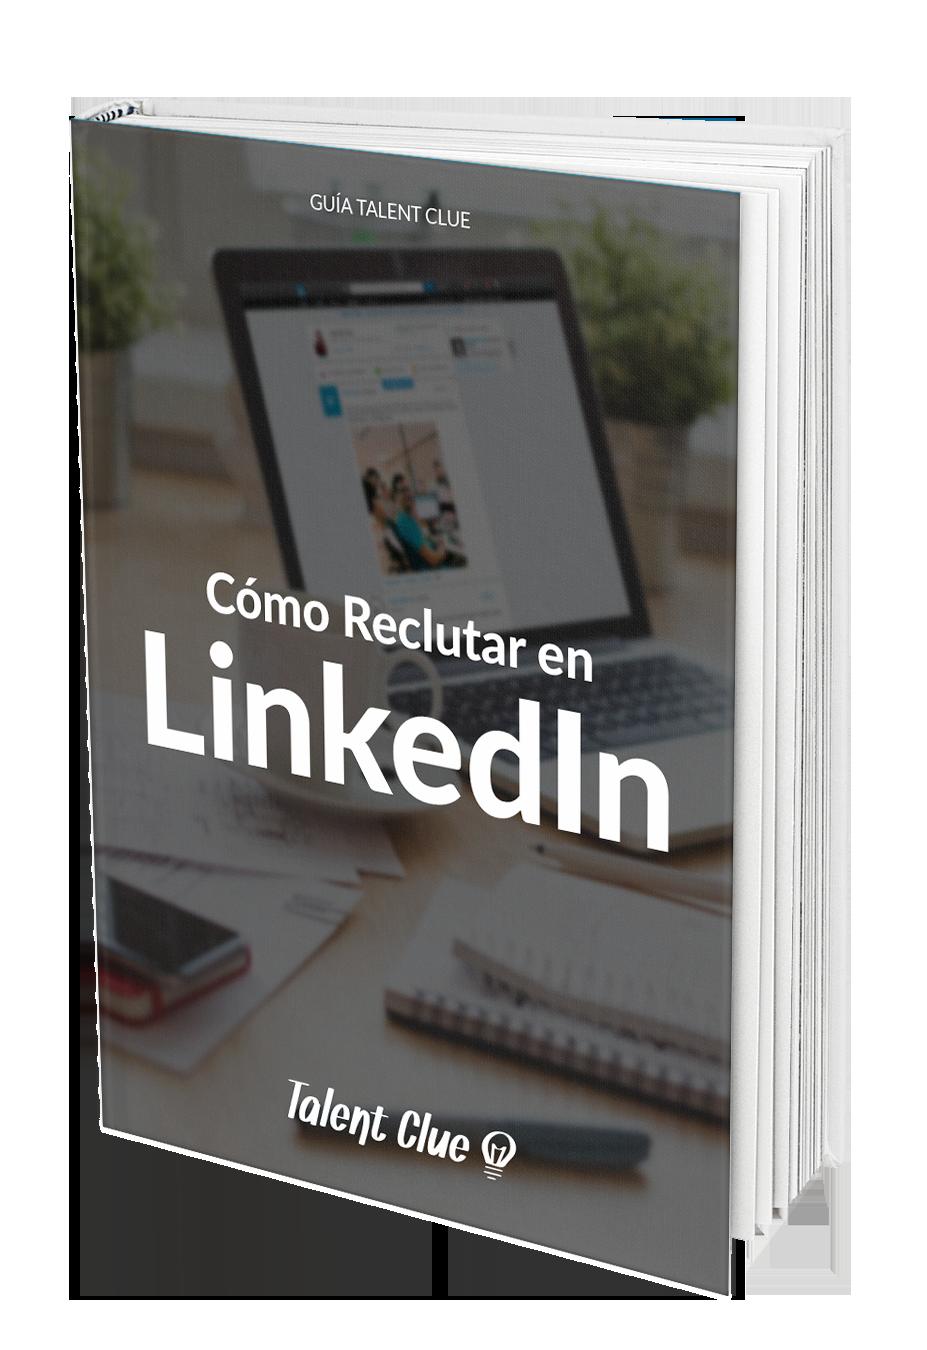 Guía reclutar en LinkedIn